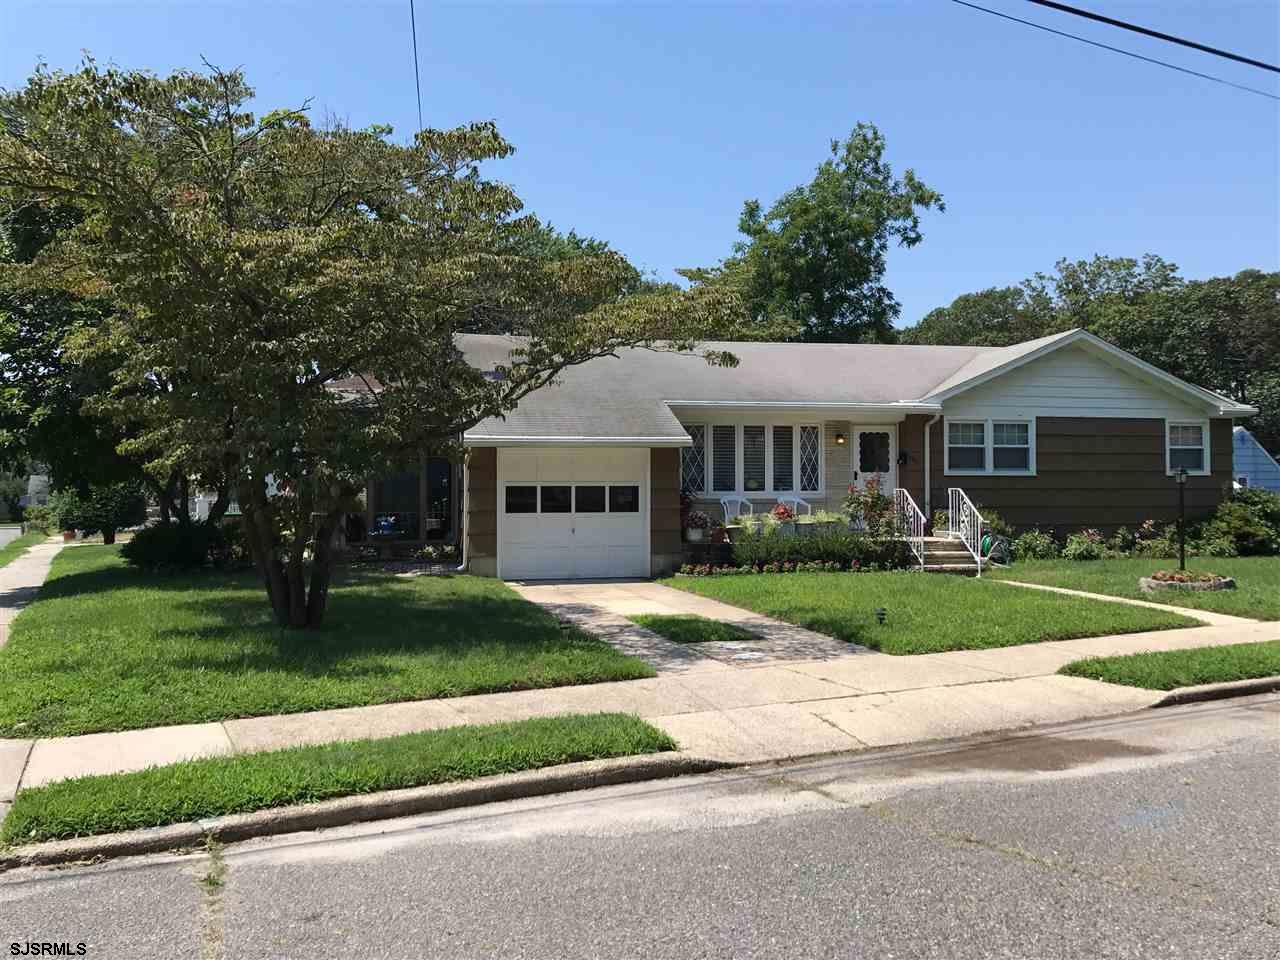 401 Elder Ave., Northfield, NJ 08225